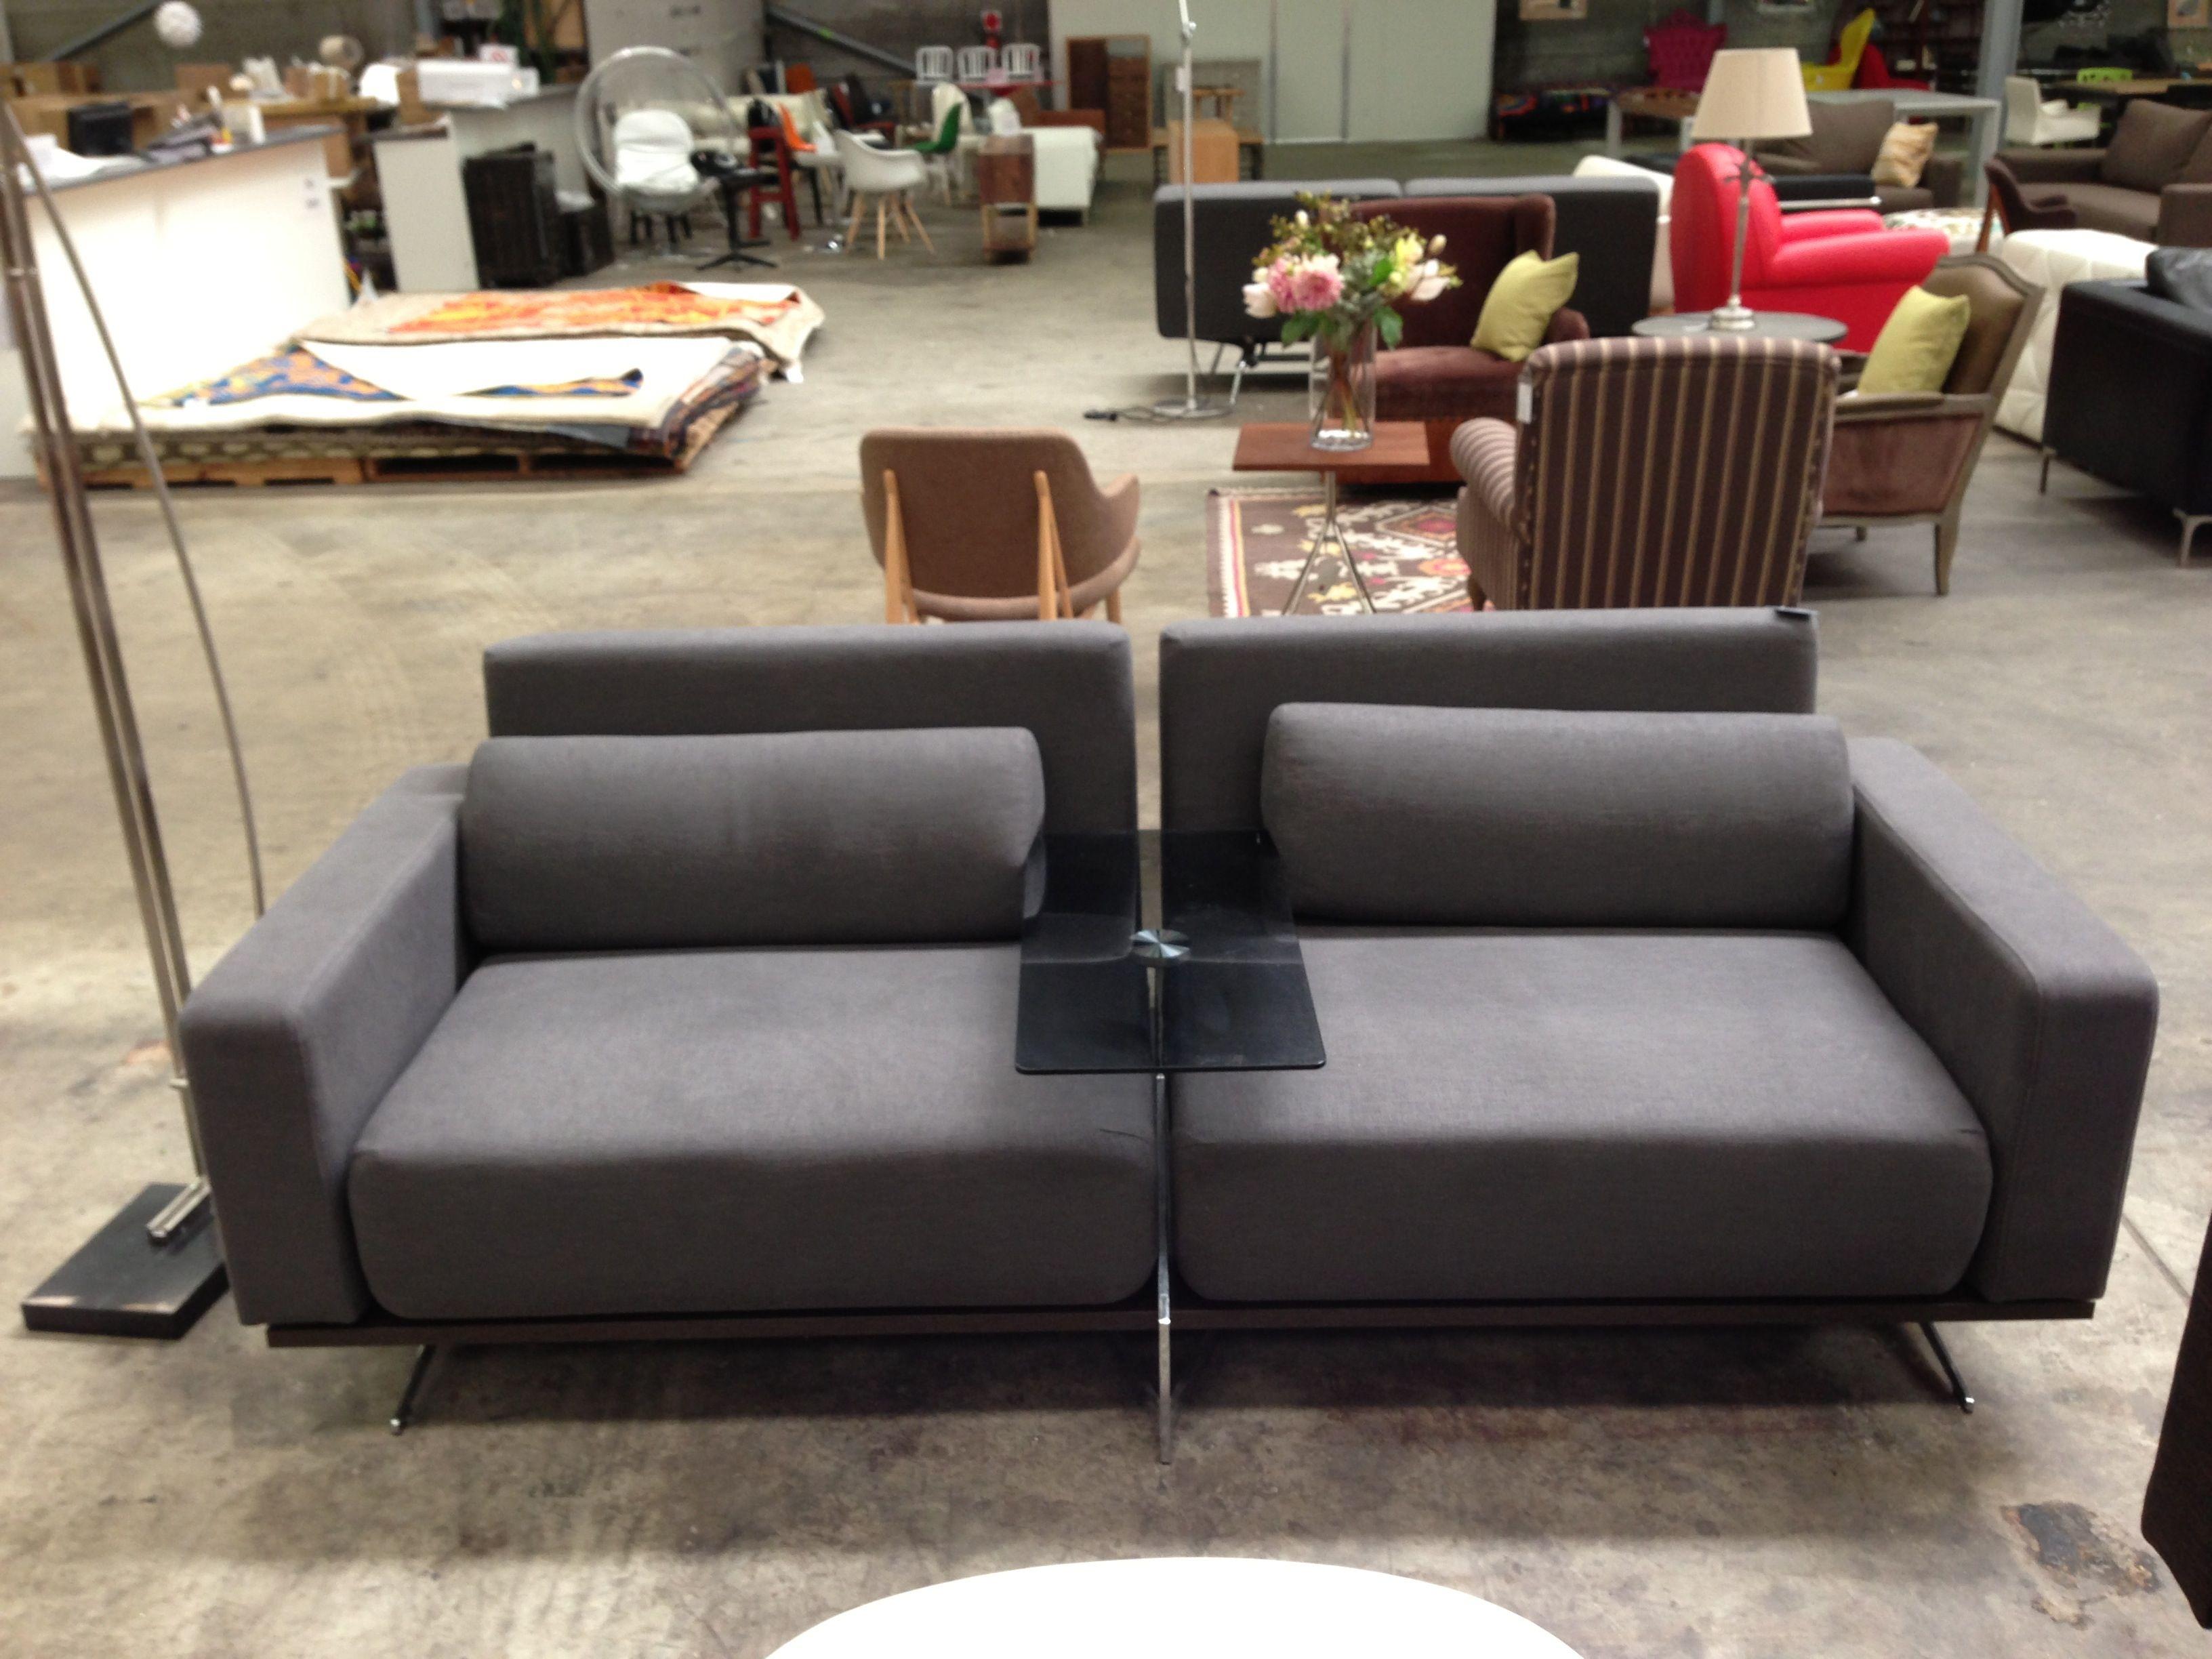 Single Sofa Bed Gold Coast Childrens Chair Replica Sofas Mah Jong Home Decor Pinterest